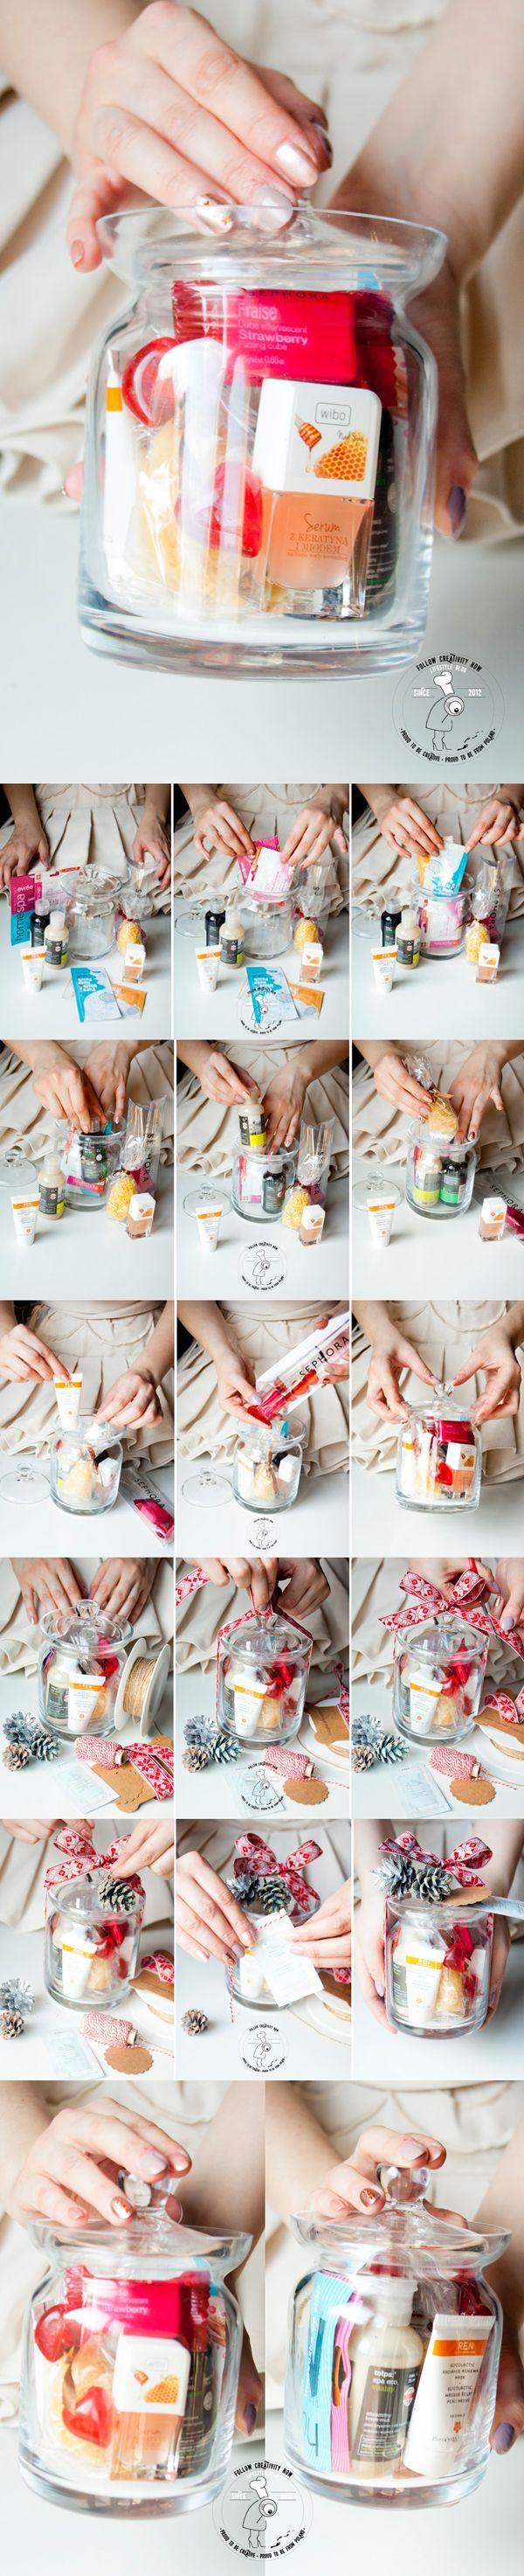 DIY - SPA in a jar - smart gift idea